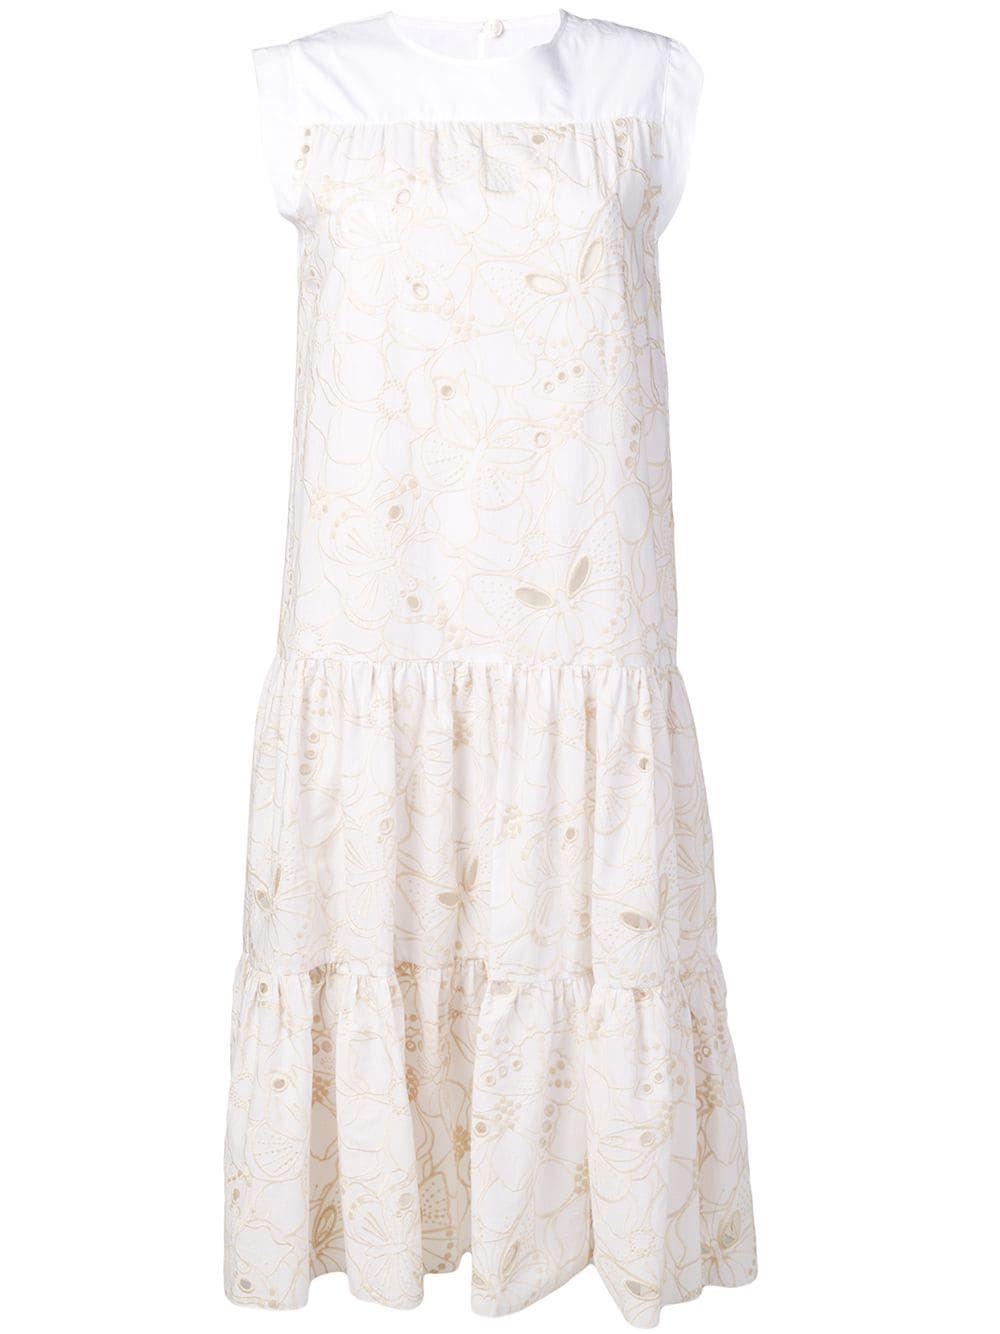 See By Chloe Tiered Summer Dress Farfetch Summer Dresses White Dress Summer Dresses [ 1334 x 1000 Pixel ]